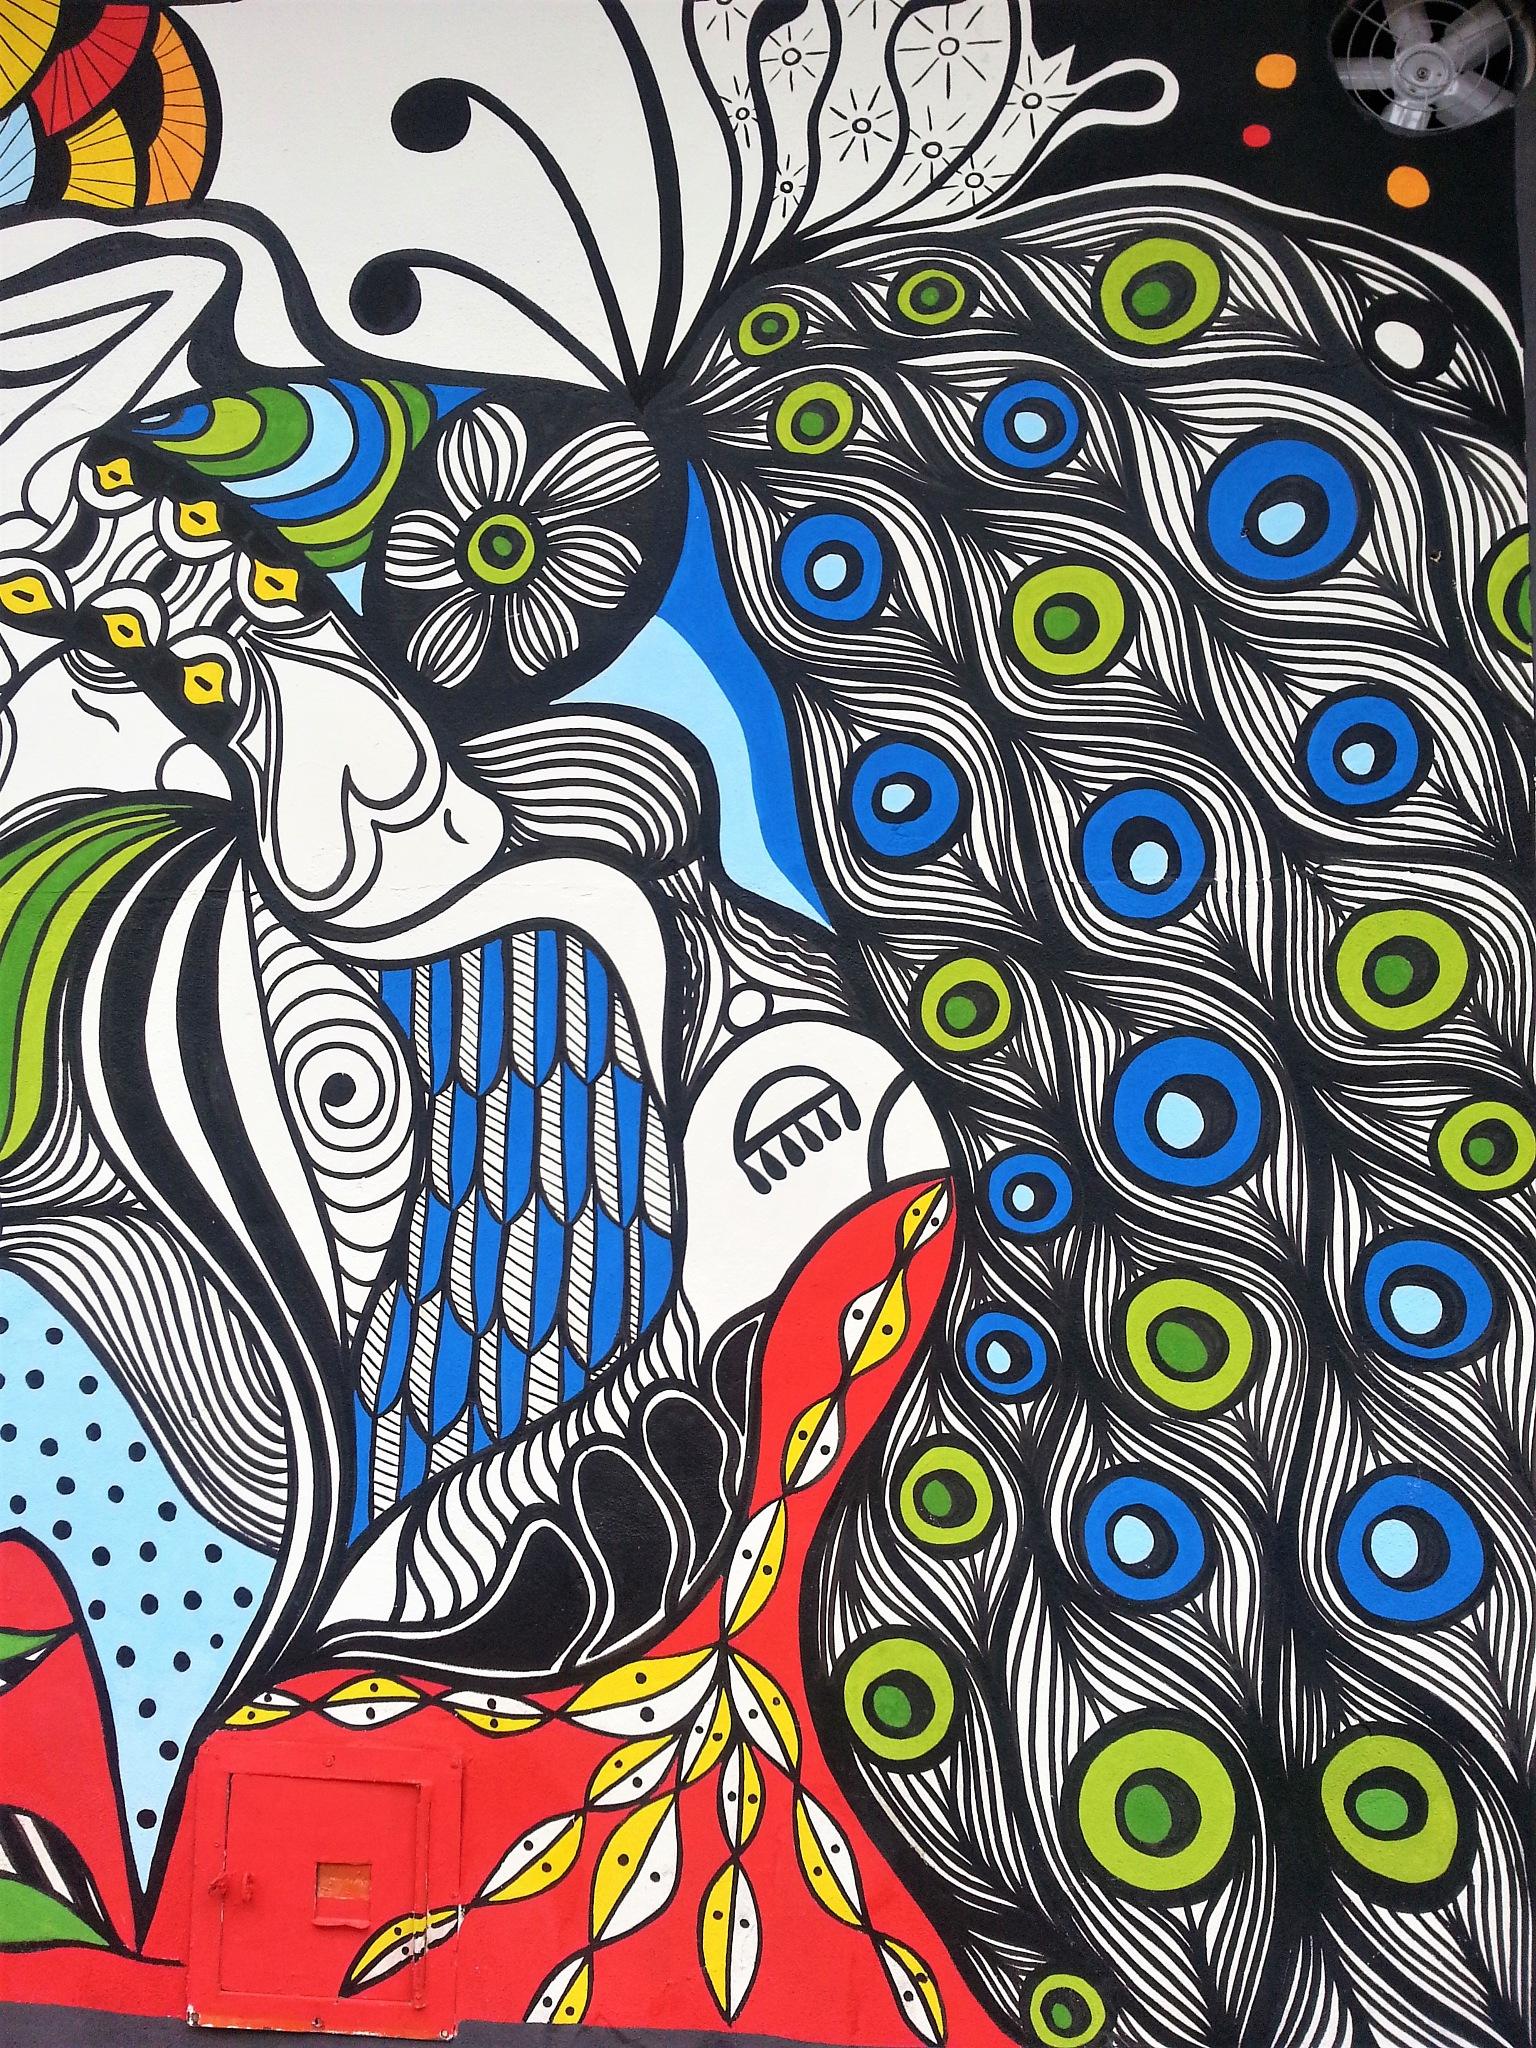 Streetart by mário lellis